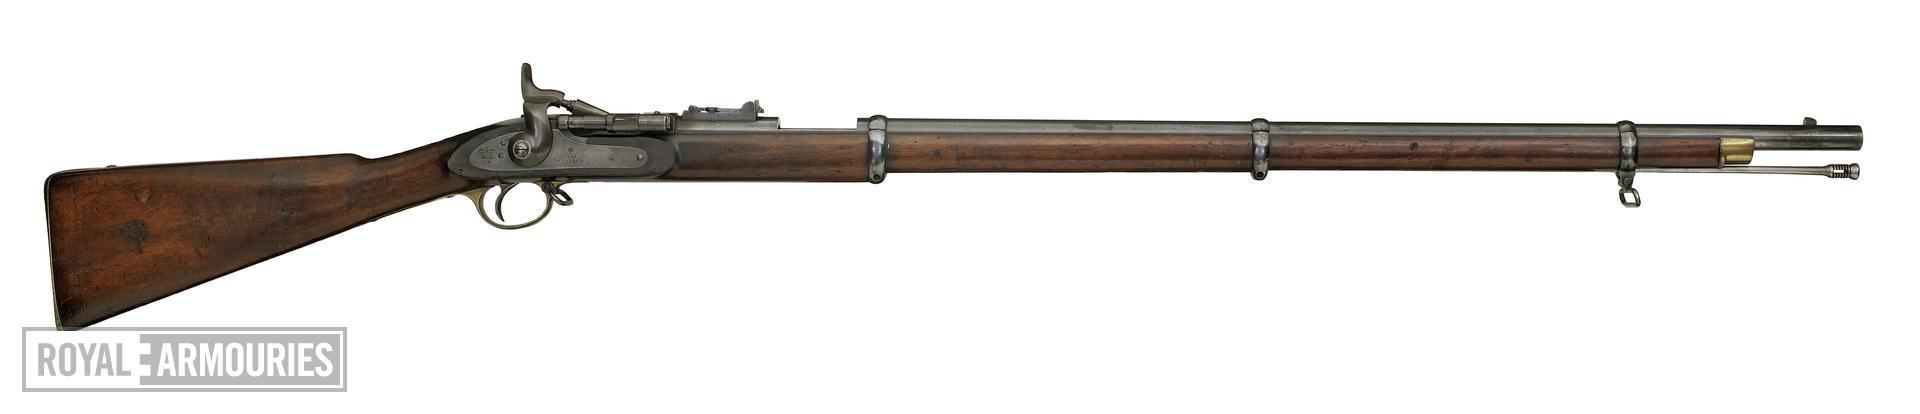 Centrefire breech-loading military rifle - Snider Mk.III, pattern sample